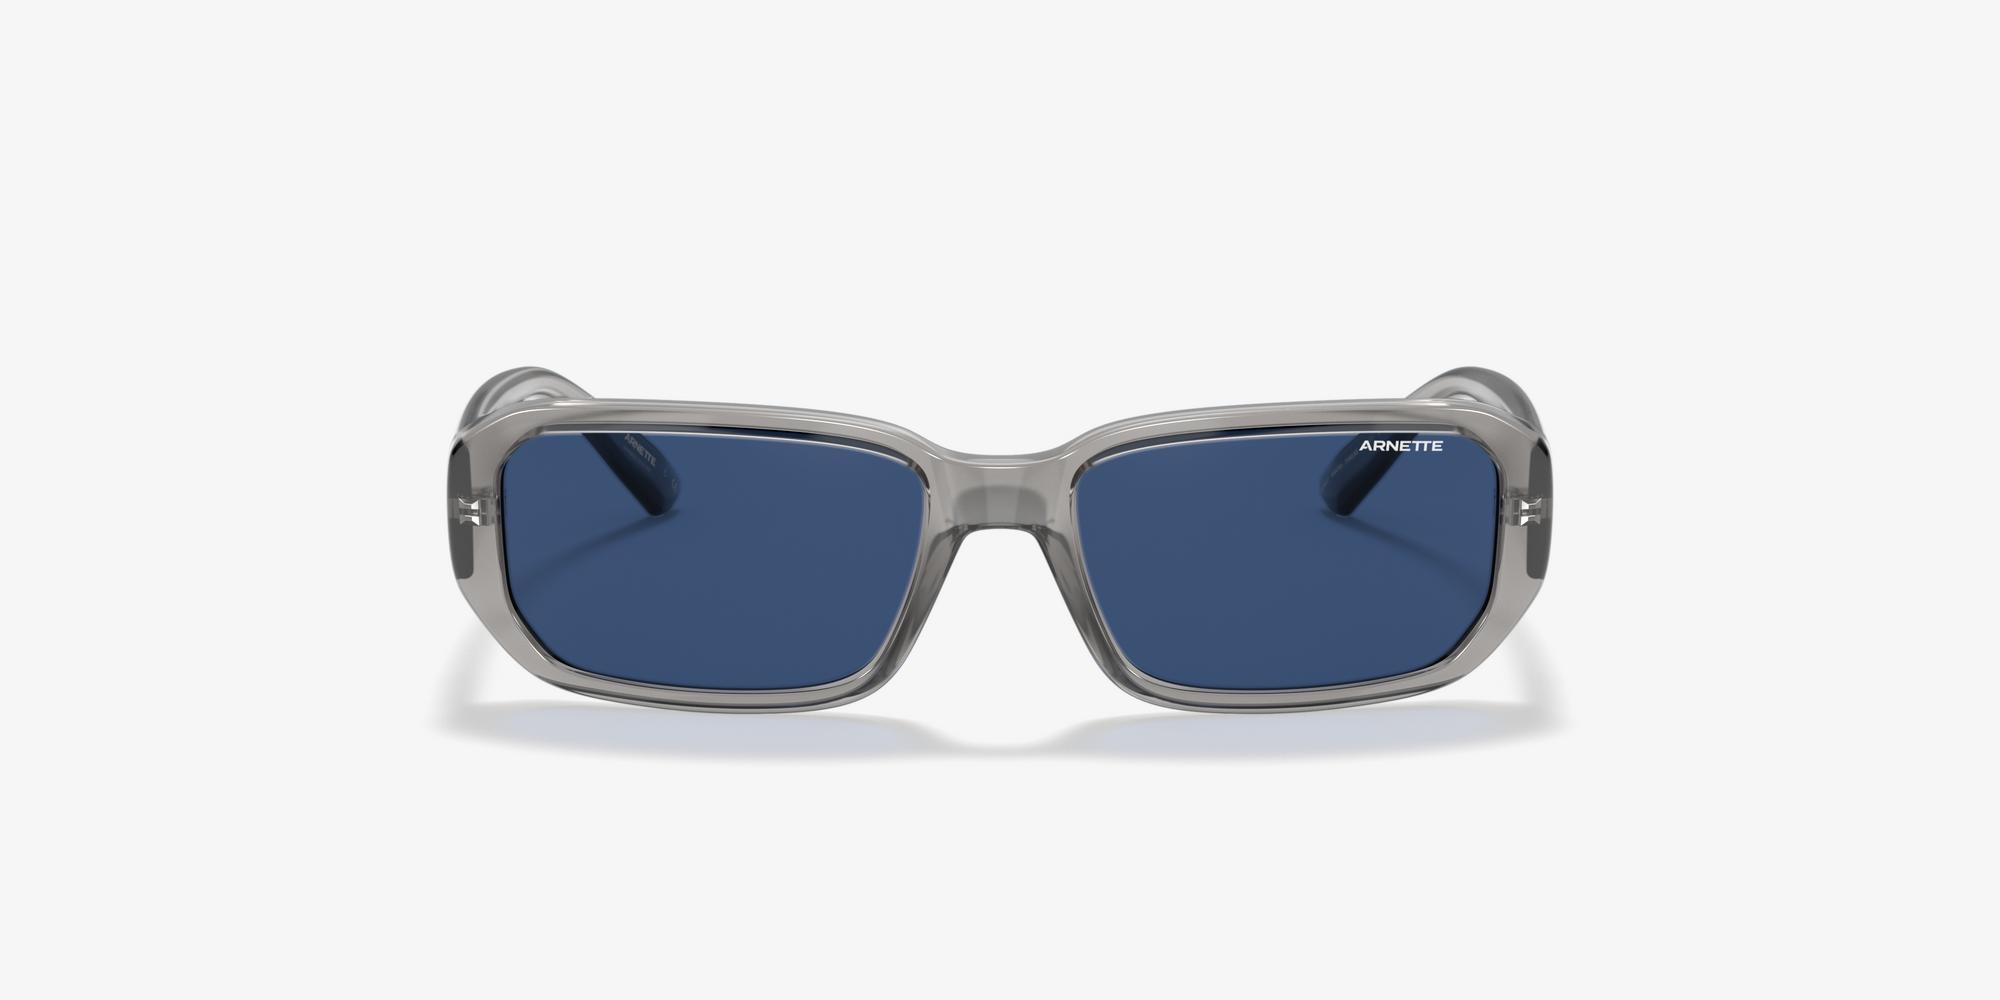 ARNETTE AN4265 265587 Transparent Yellow Grey 55 mm Men/'s Sunglasses